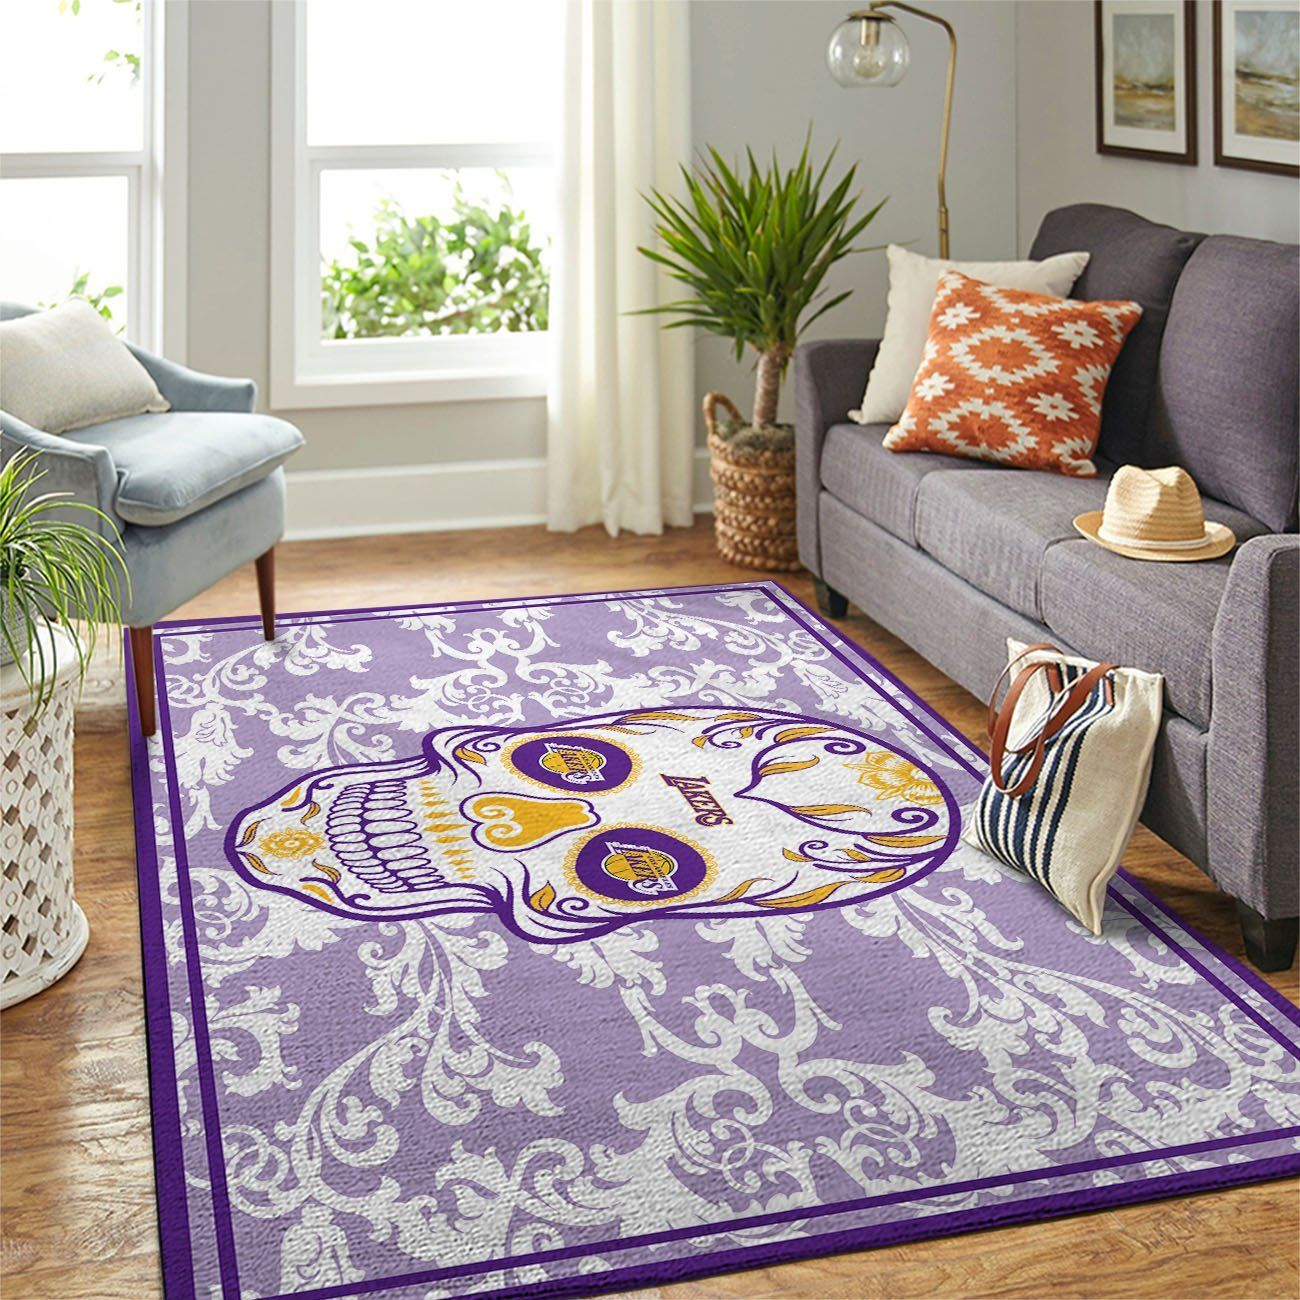 Amazon Los Angeles Lakers Living Room Area No3623 Rug